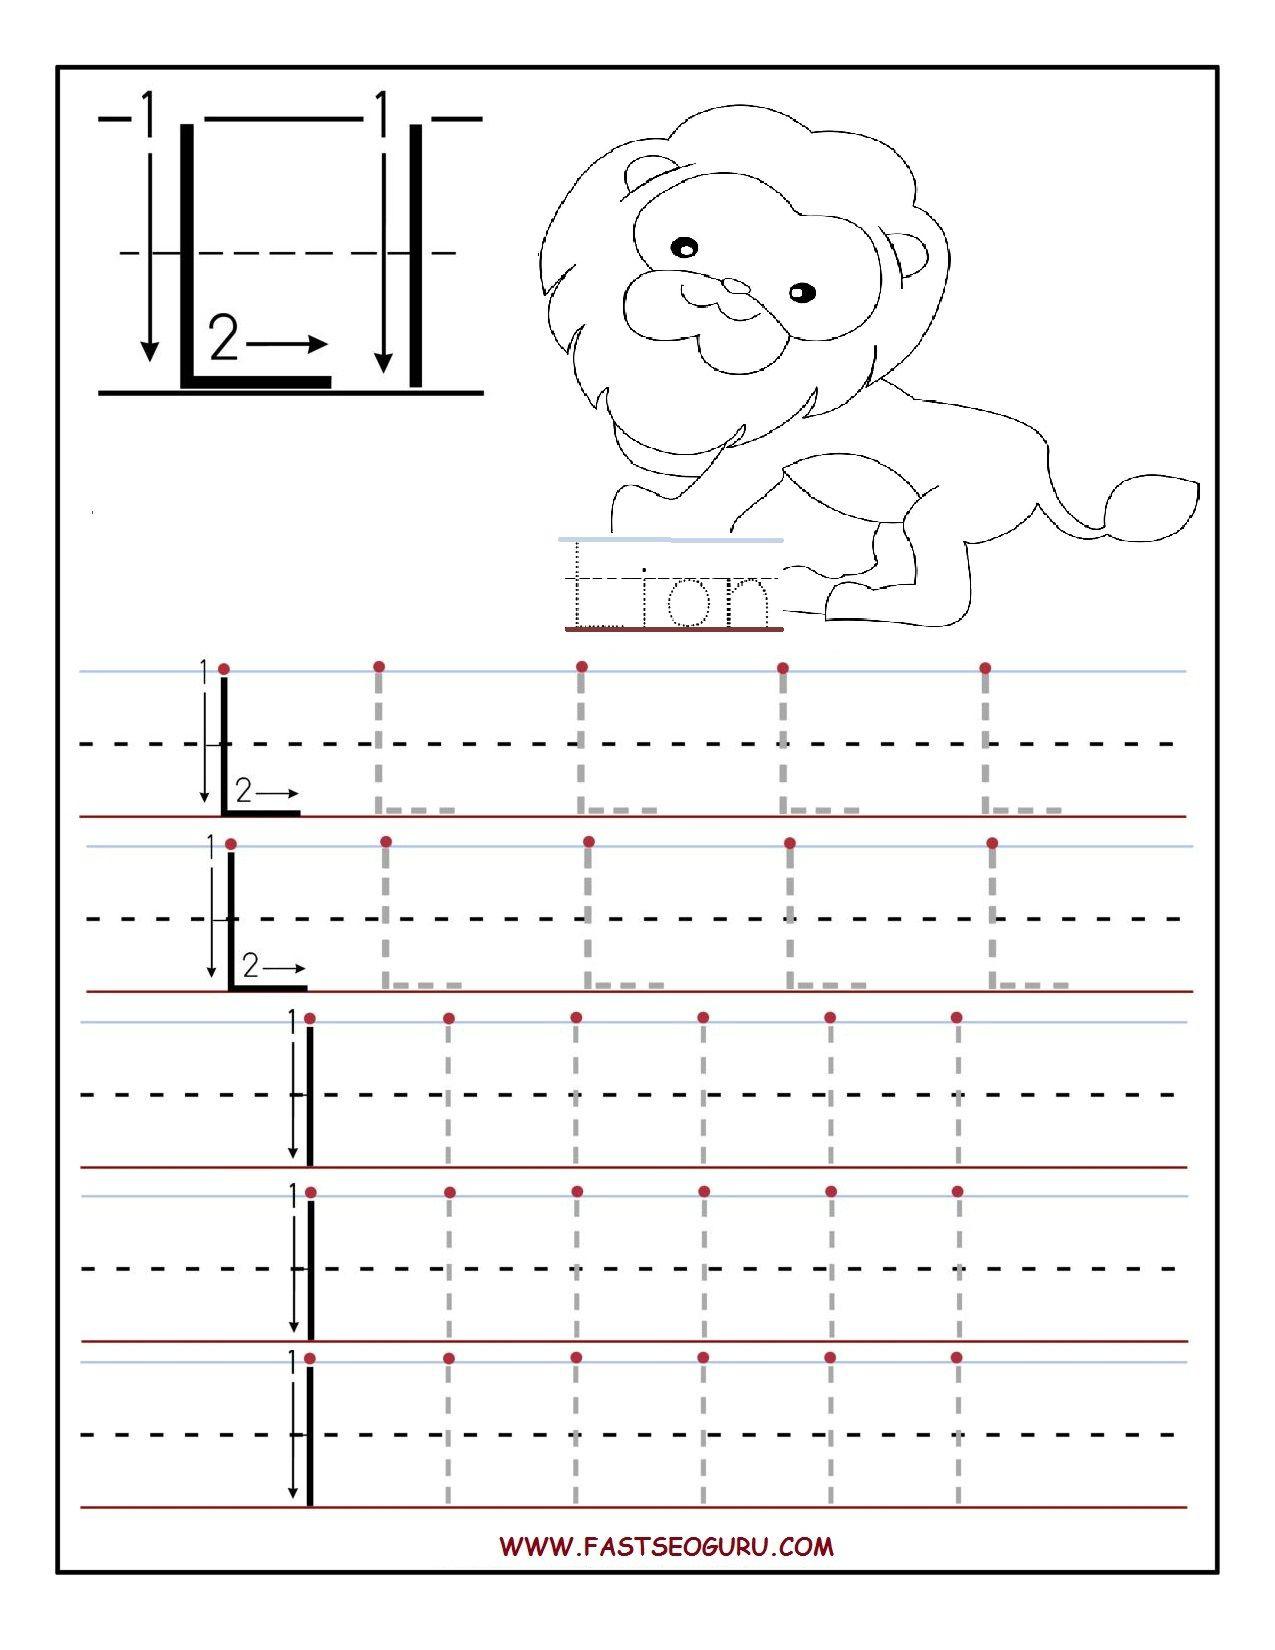 Printable Letter L Tracing Worksheets For Preschool with Letter L Worksheets Twisty Noodle